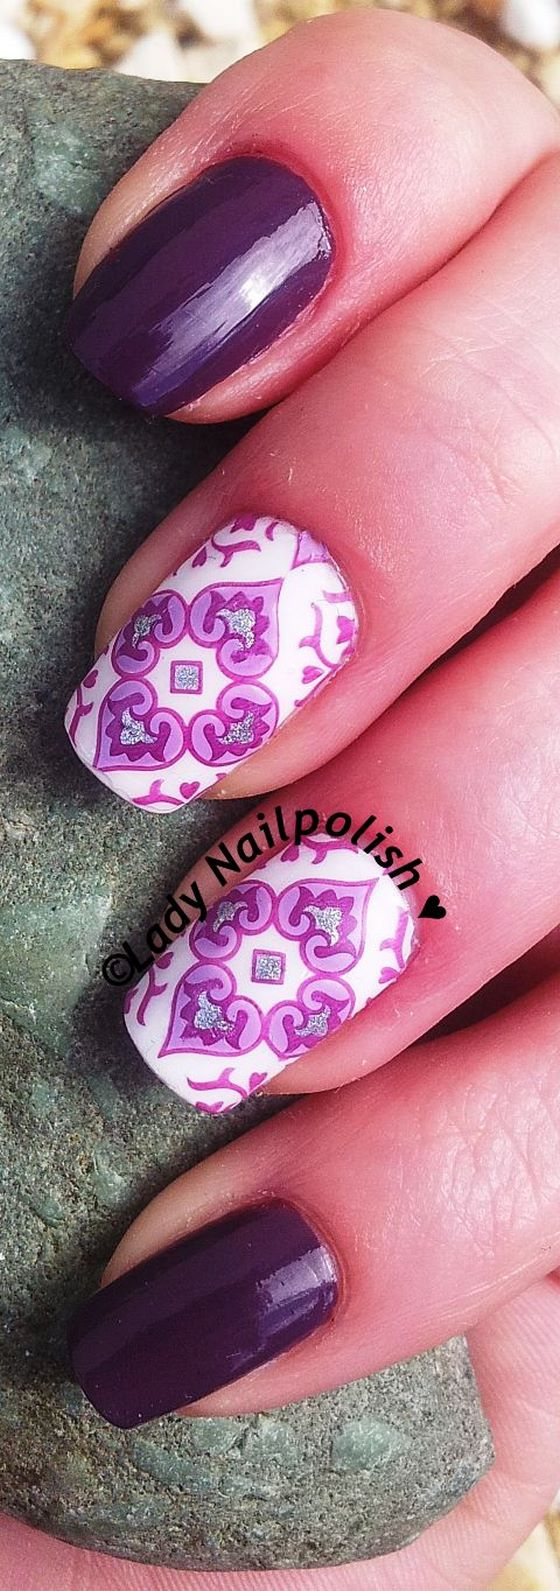 diseño de uñas moradas estampadas